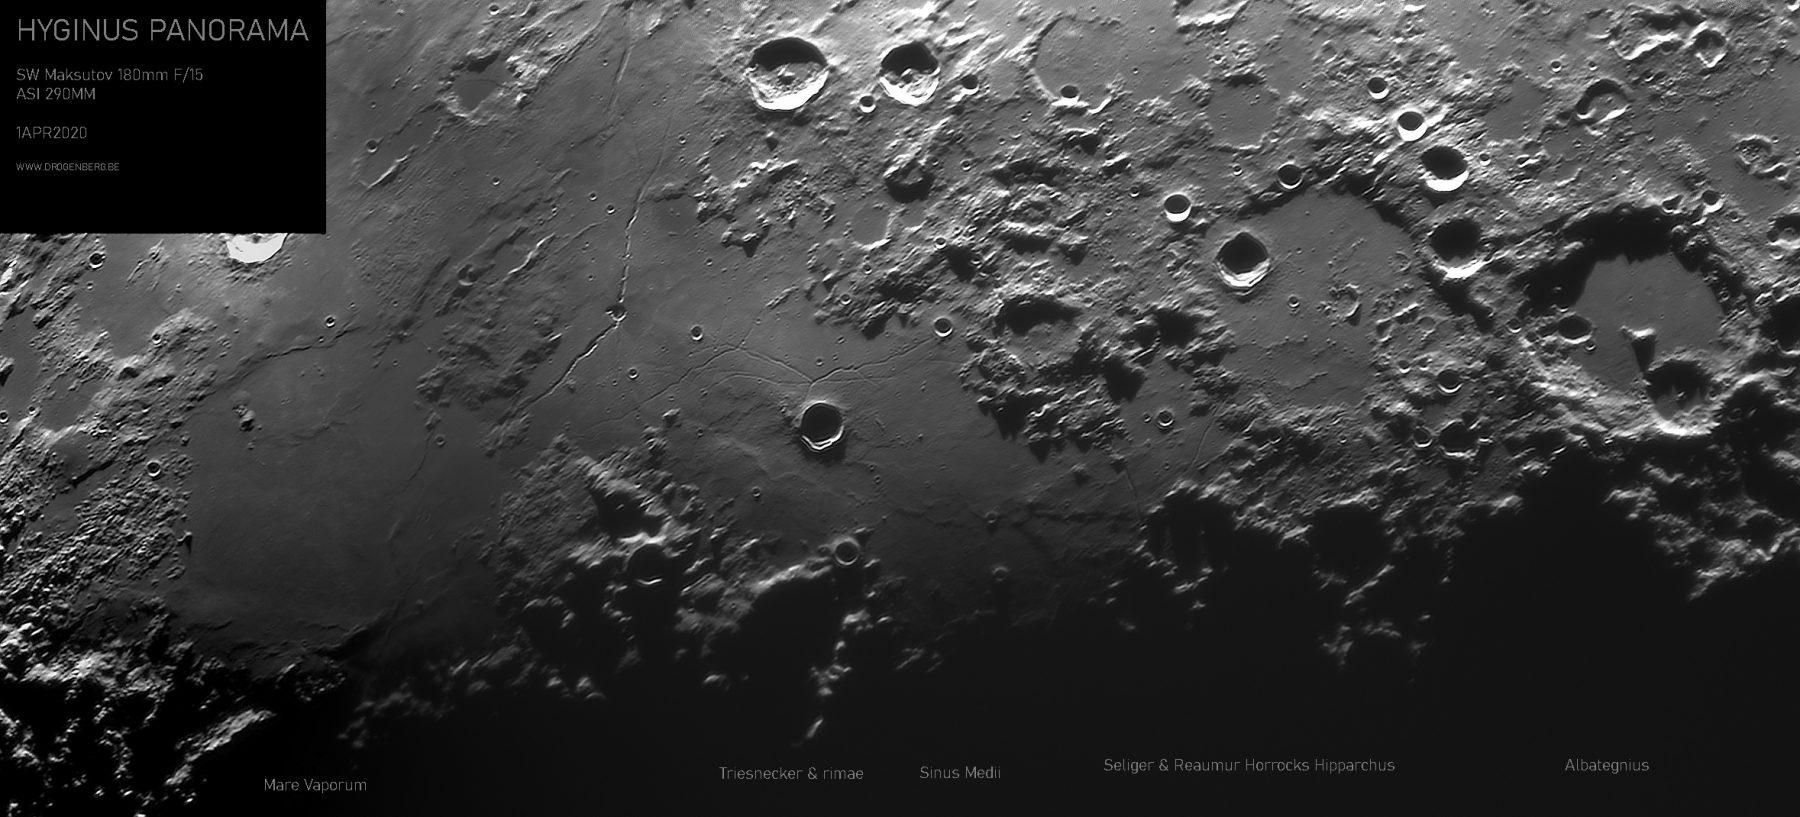 Hyginus-Panorama-Ann